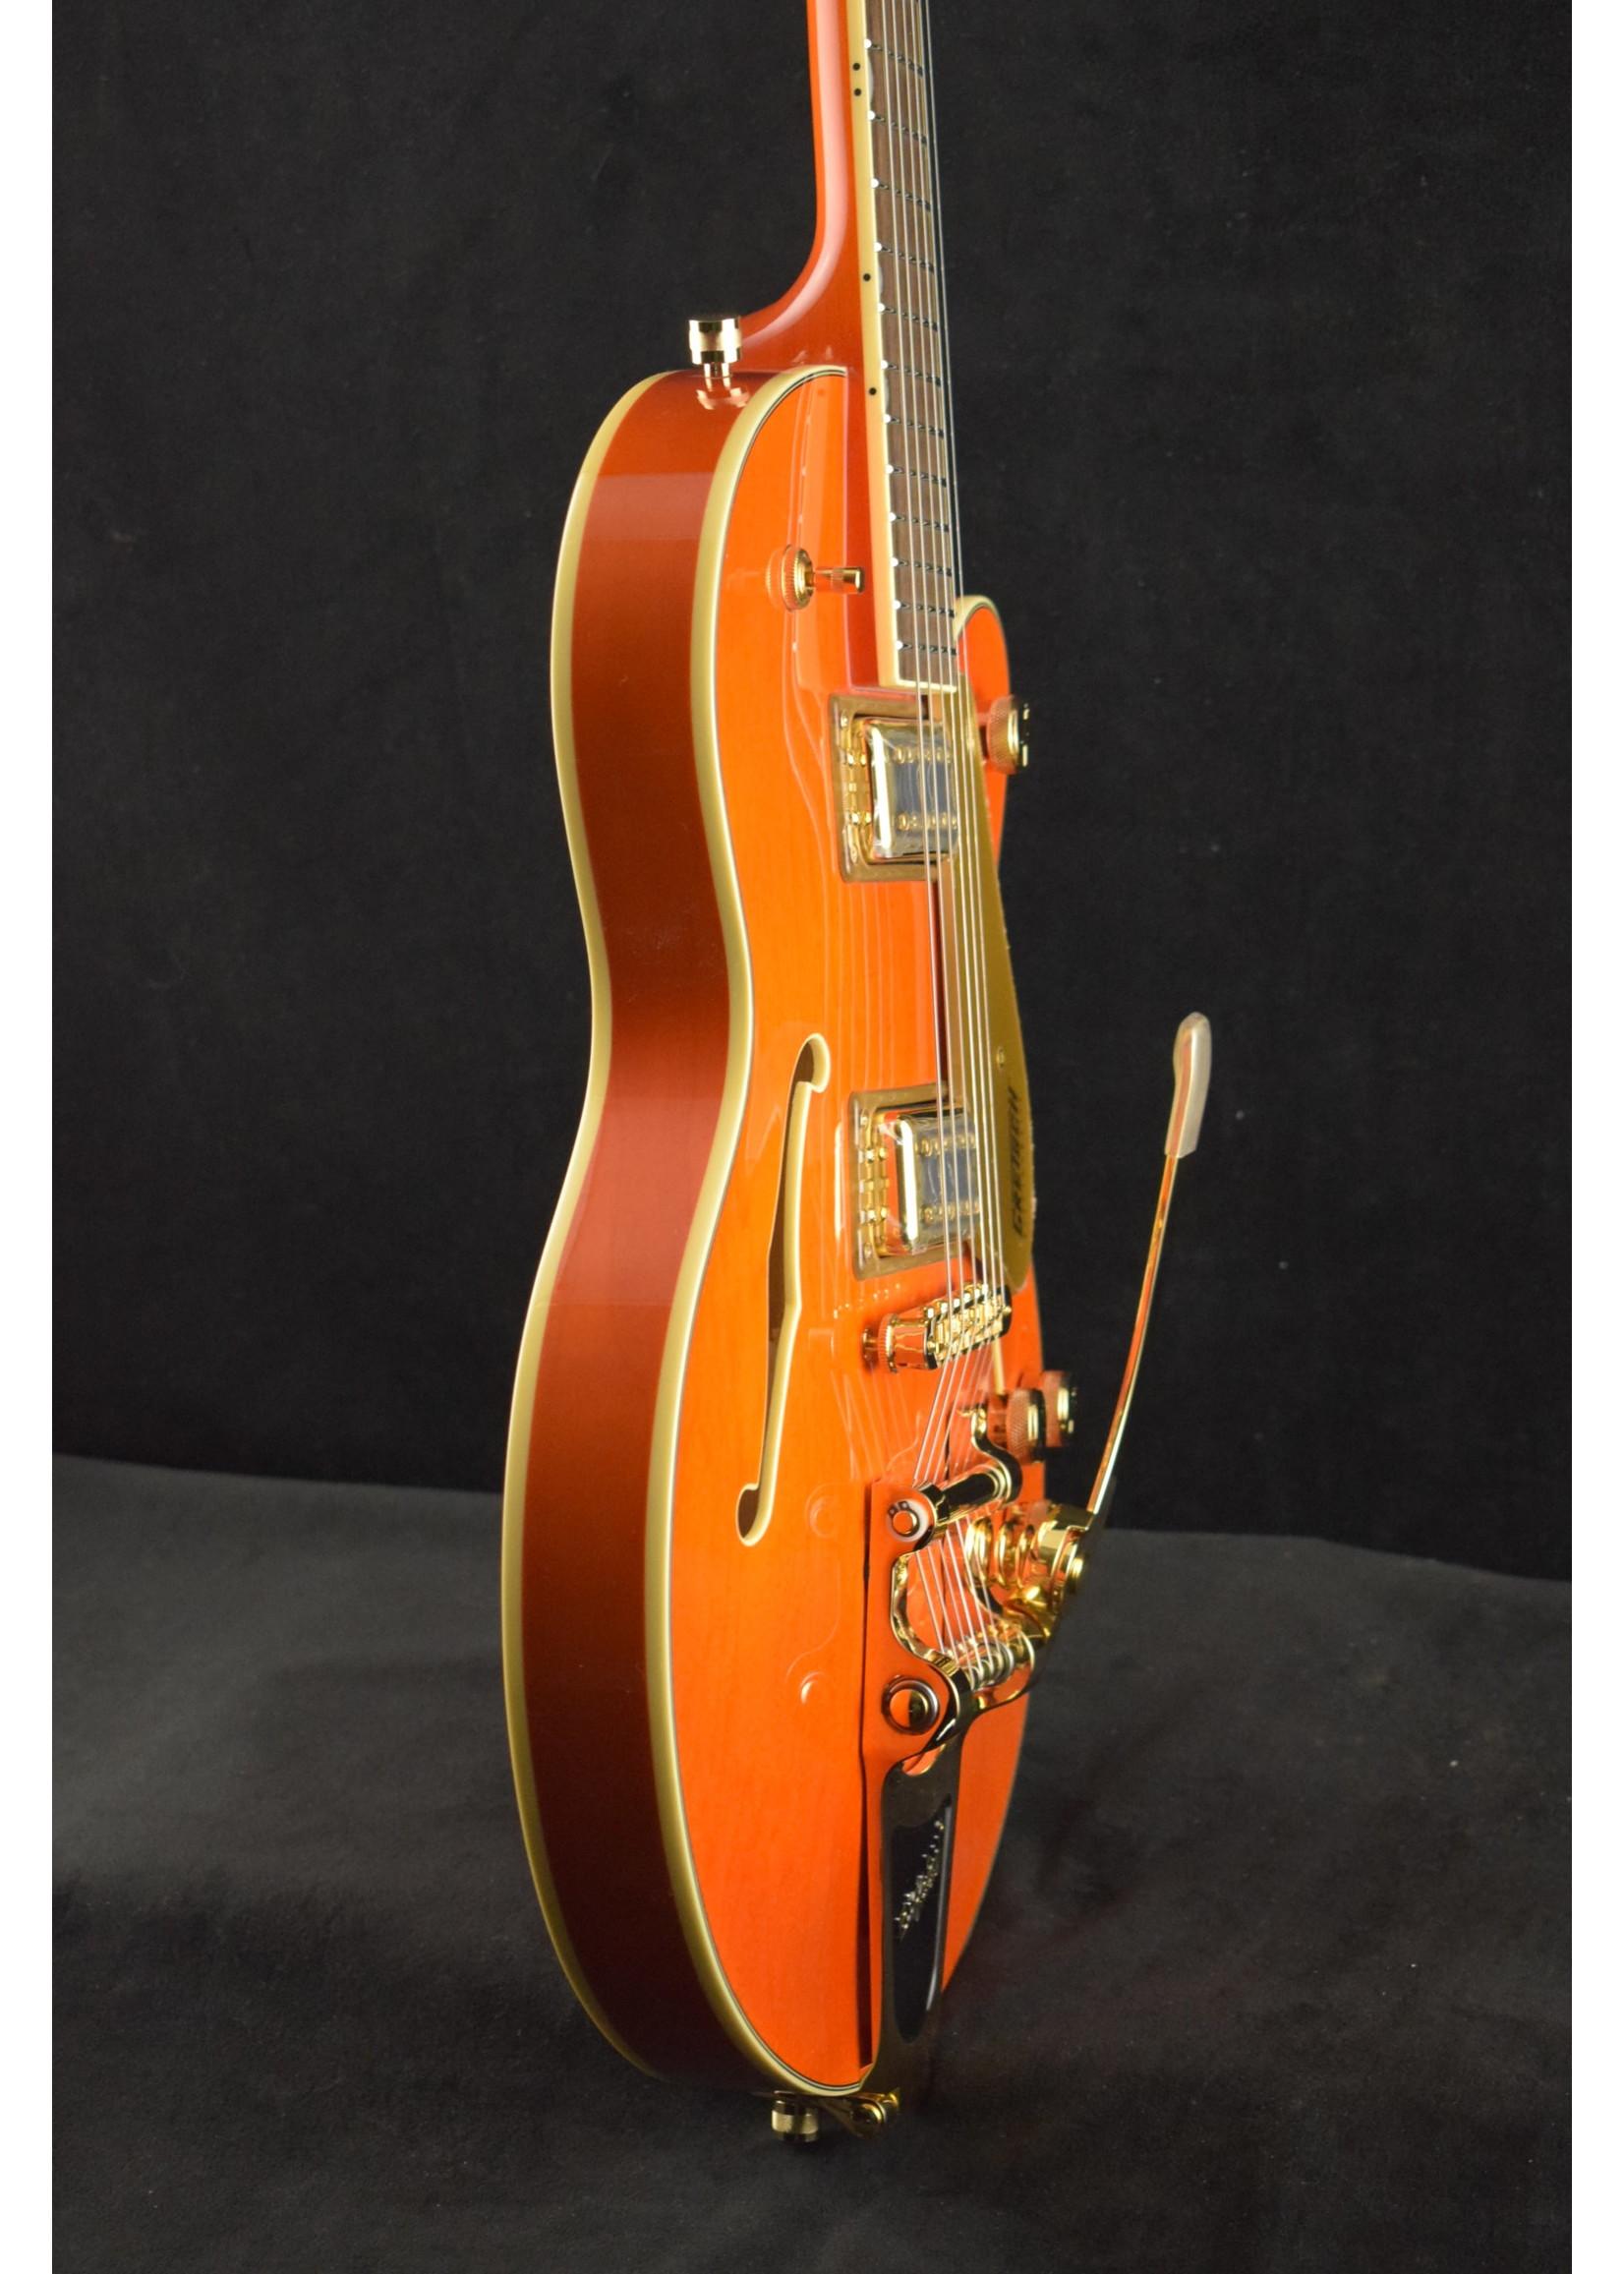 Gretsch Gretsch G5655TG Electromatic Center Block Jr. Orange Stain